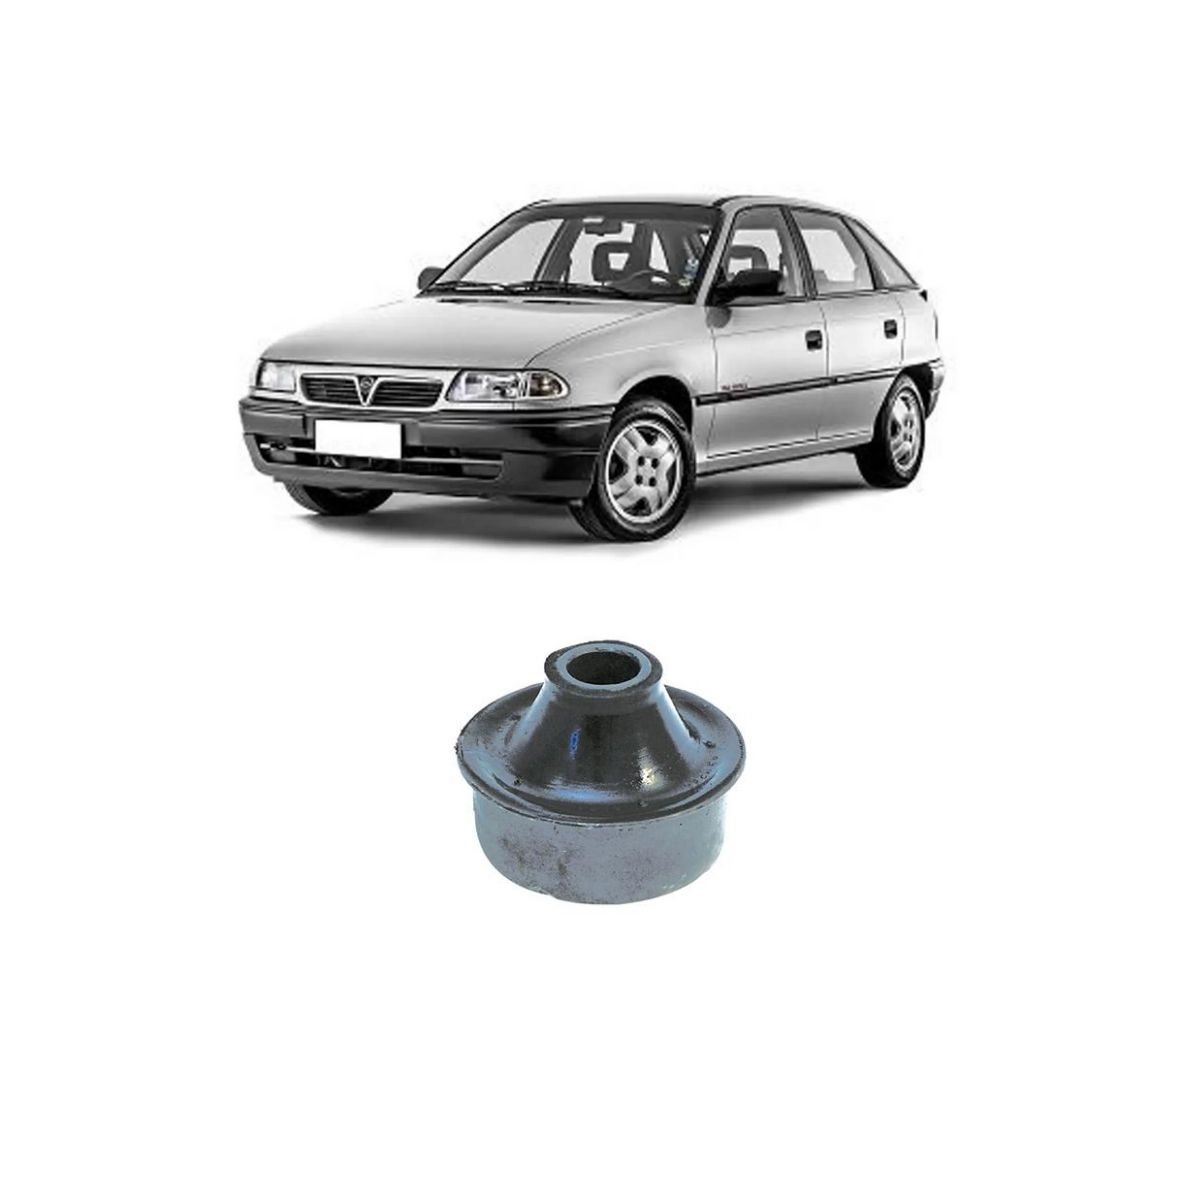 Bucha Bandeja Traseira Chevrolet Astra 1995/1996